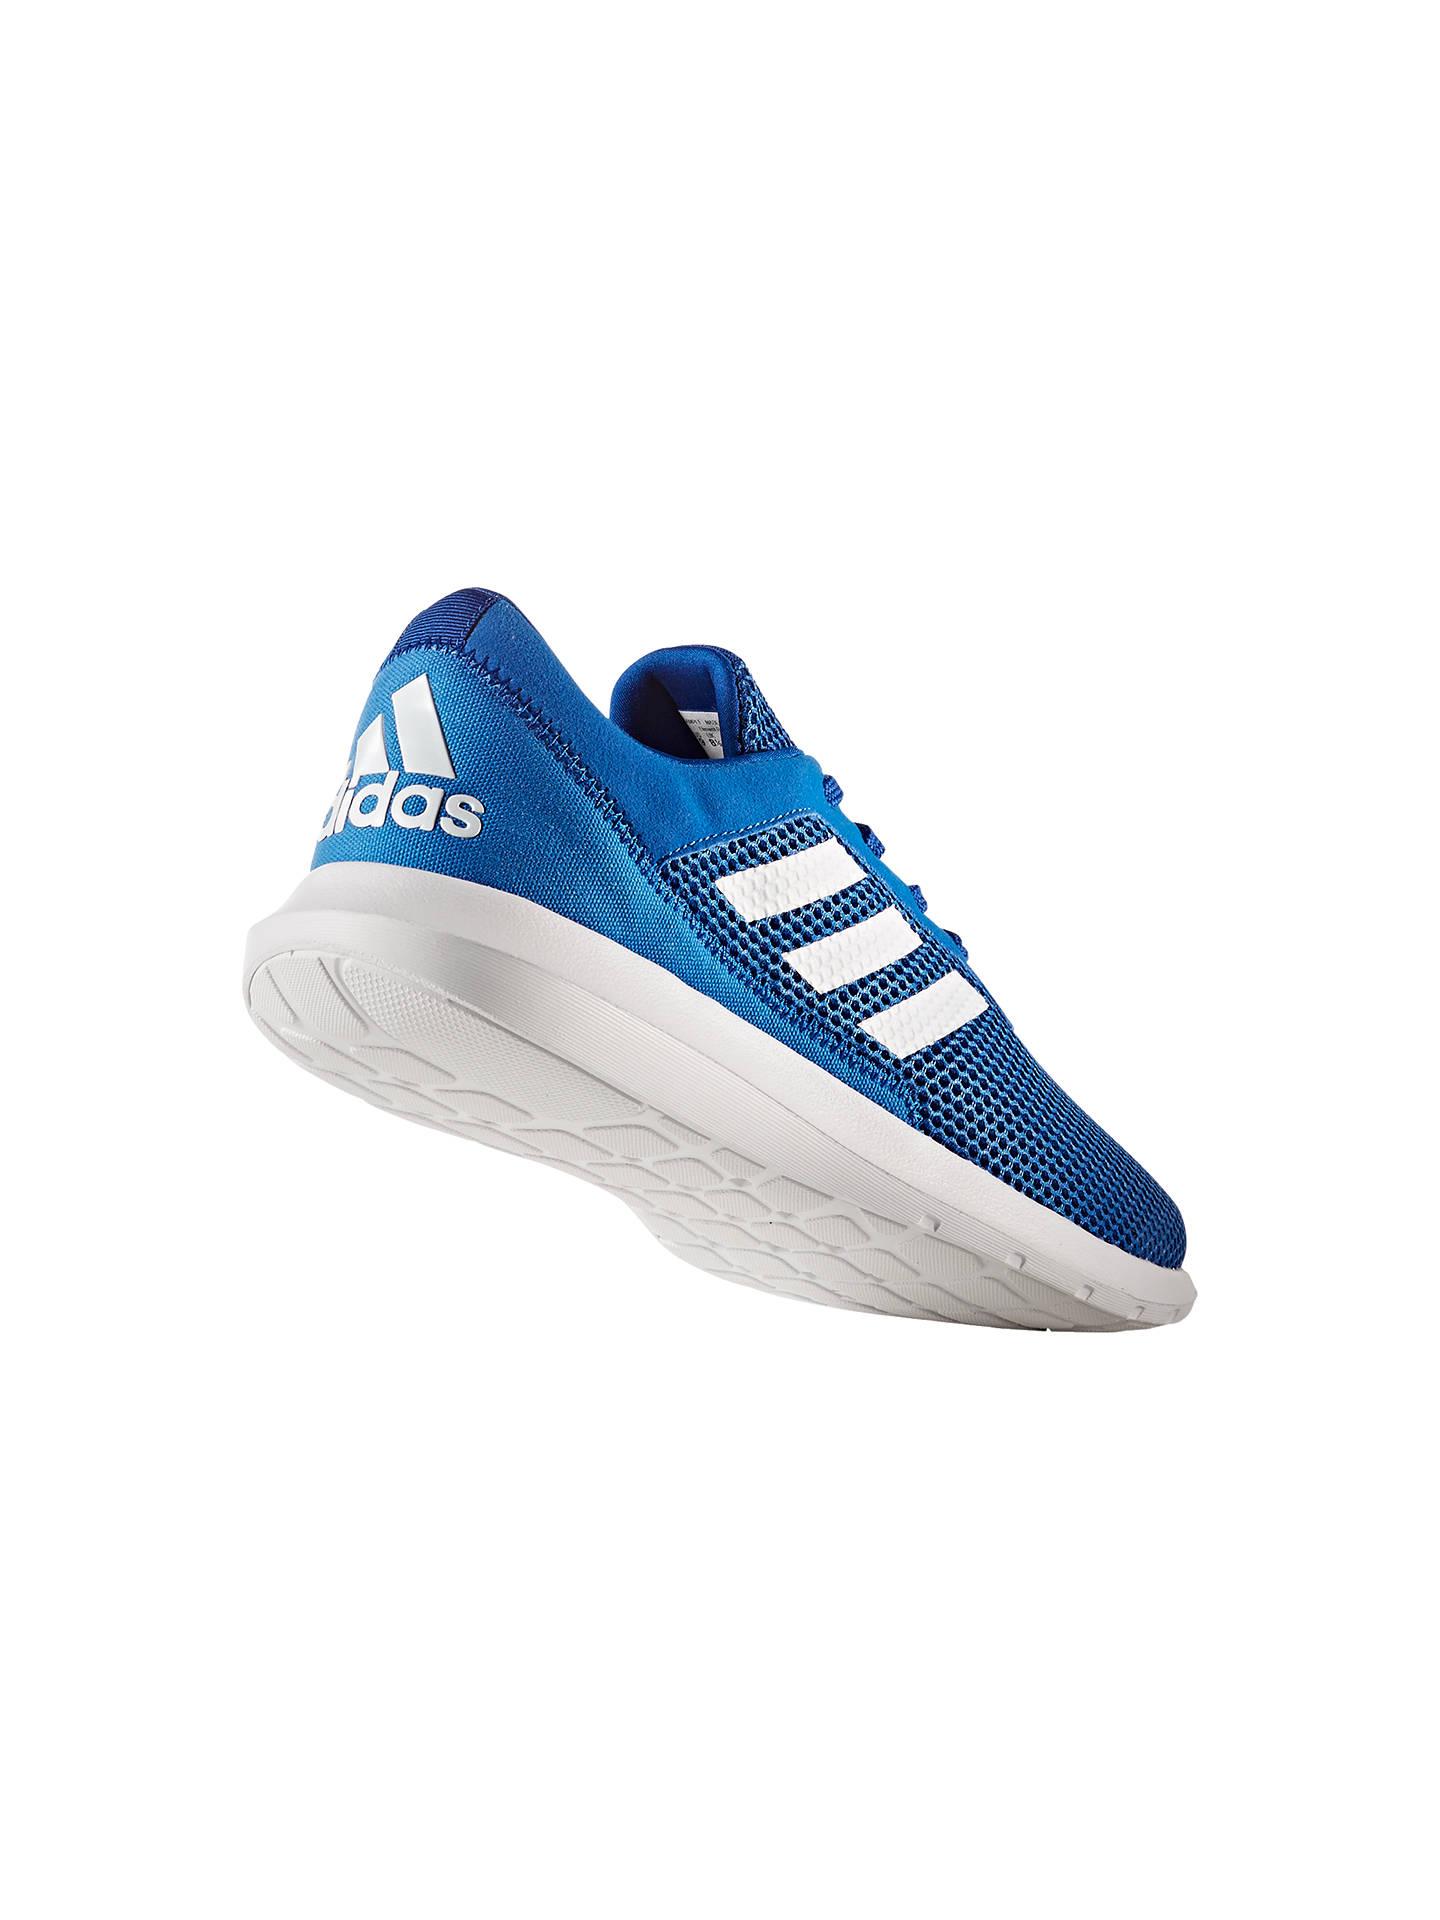 adidas Element Refresh 3 Men's Running Shoes, Blue at John